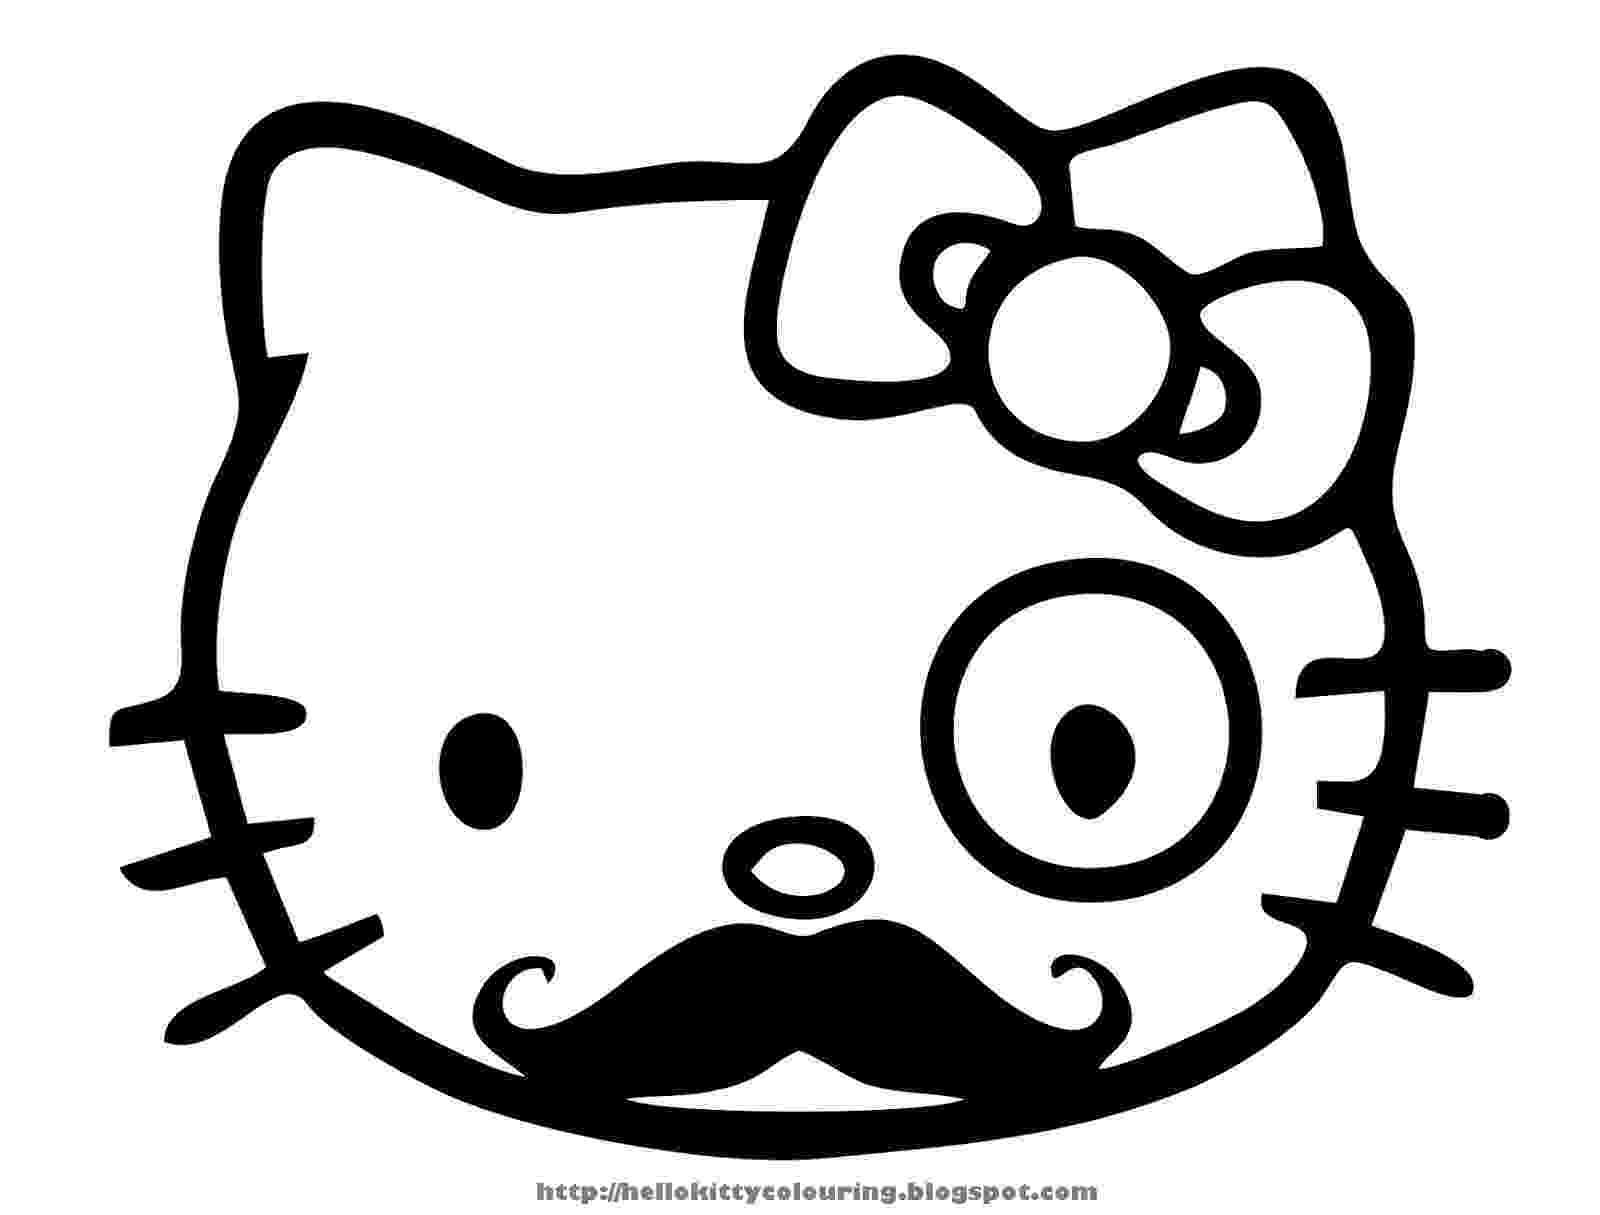 hello kitty coloring book hello kitty coloring pages coloring book kitty hello